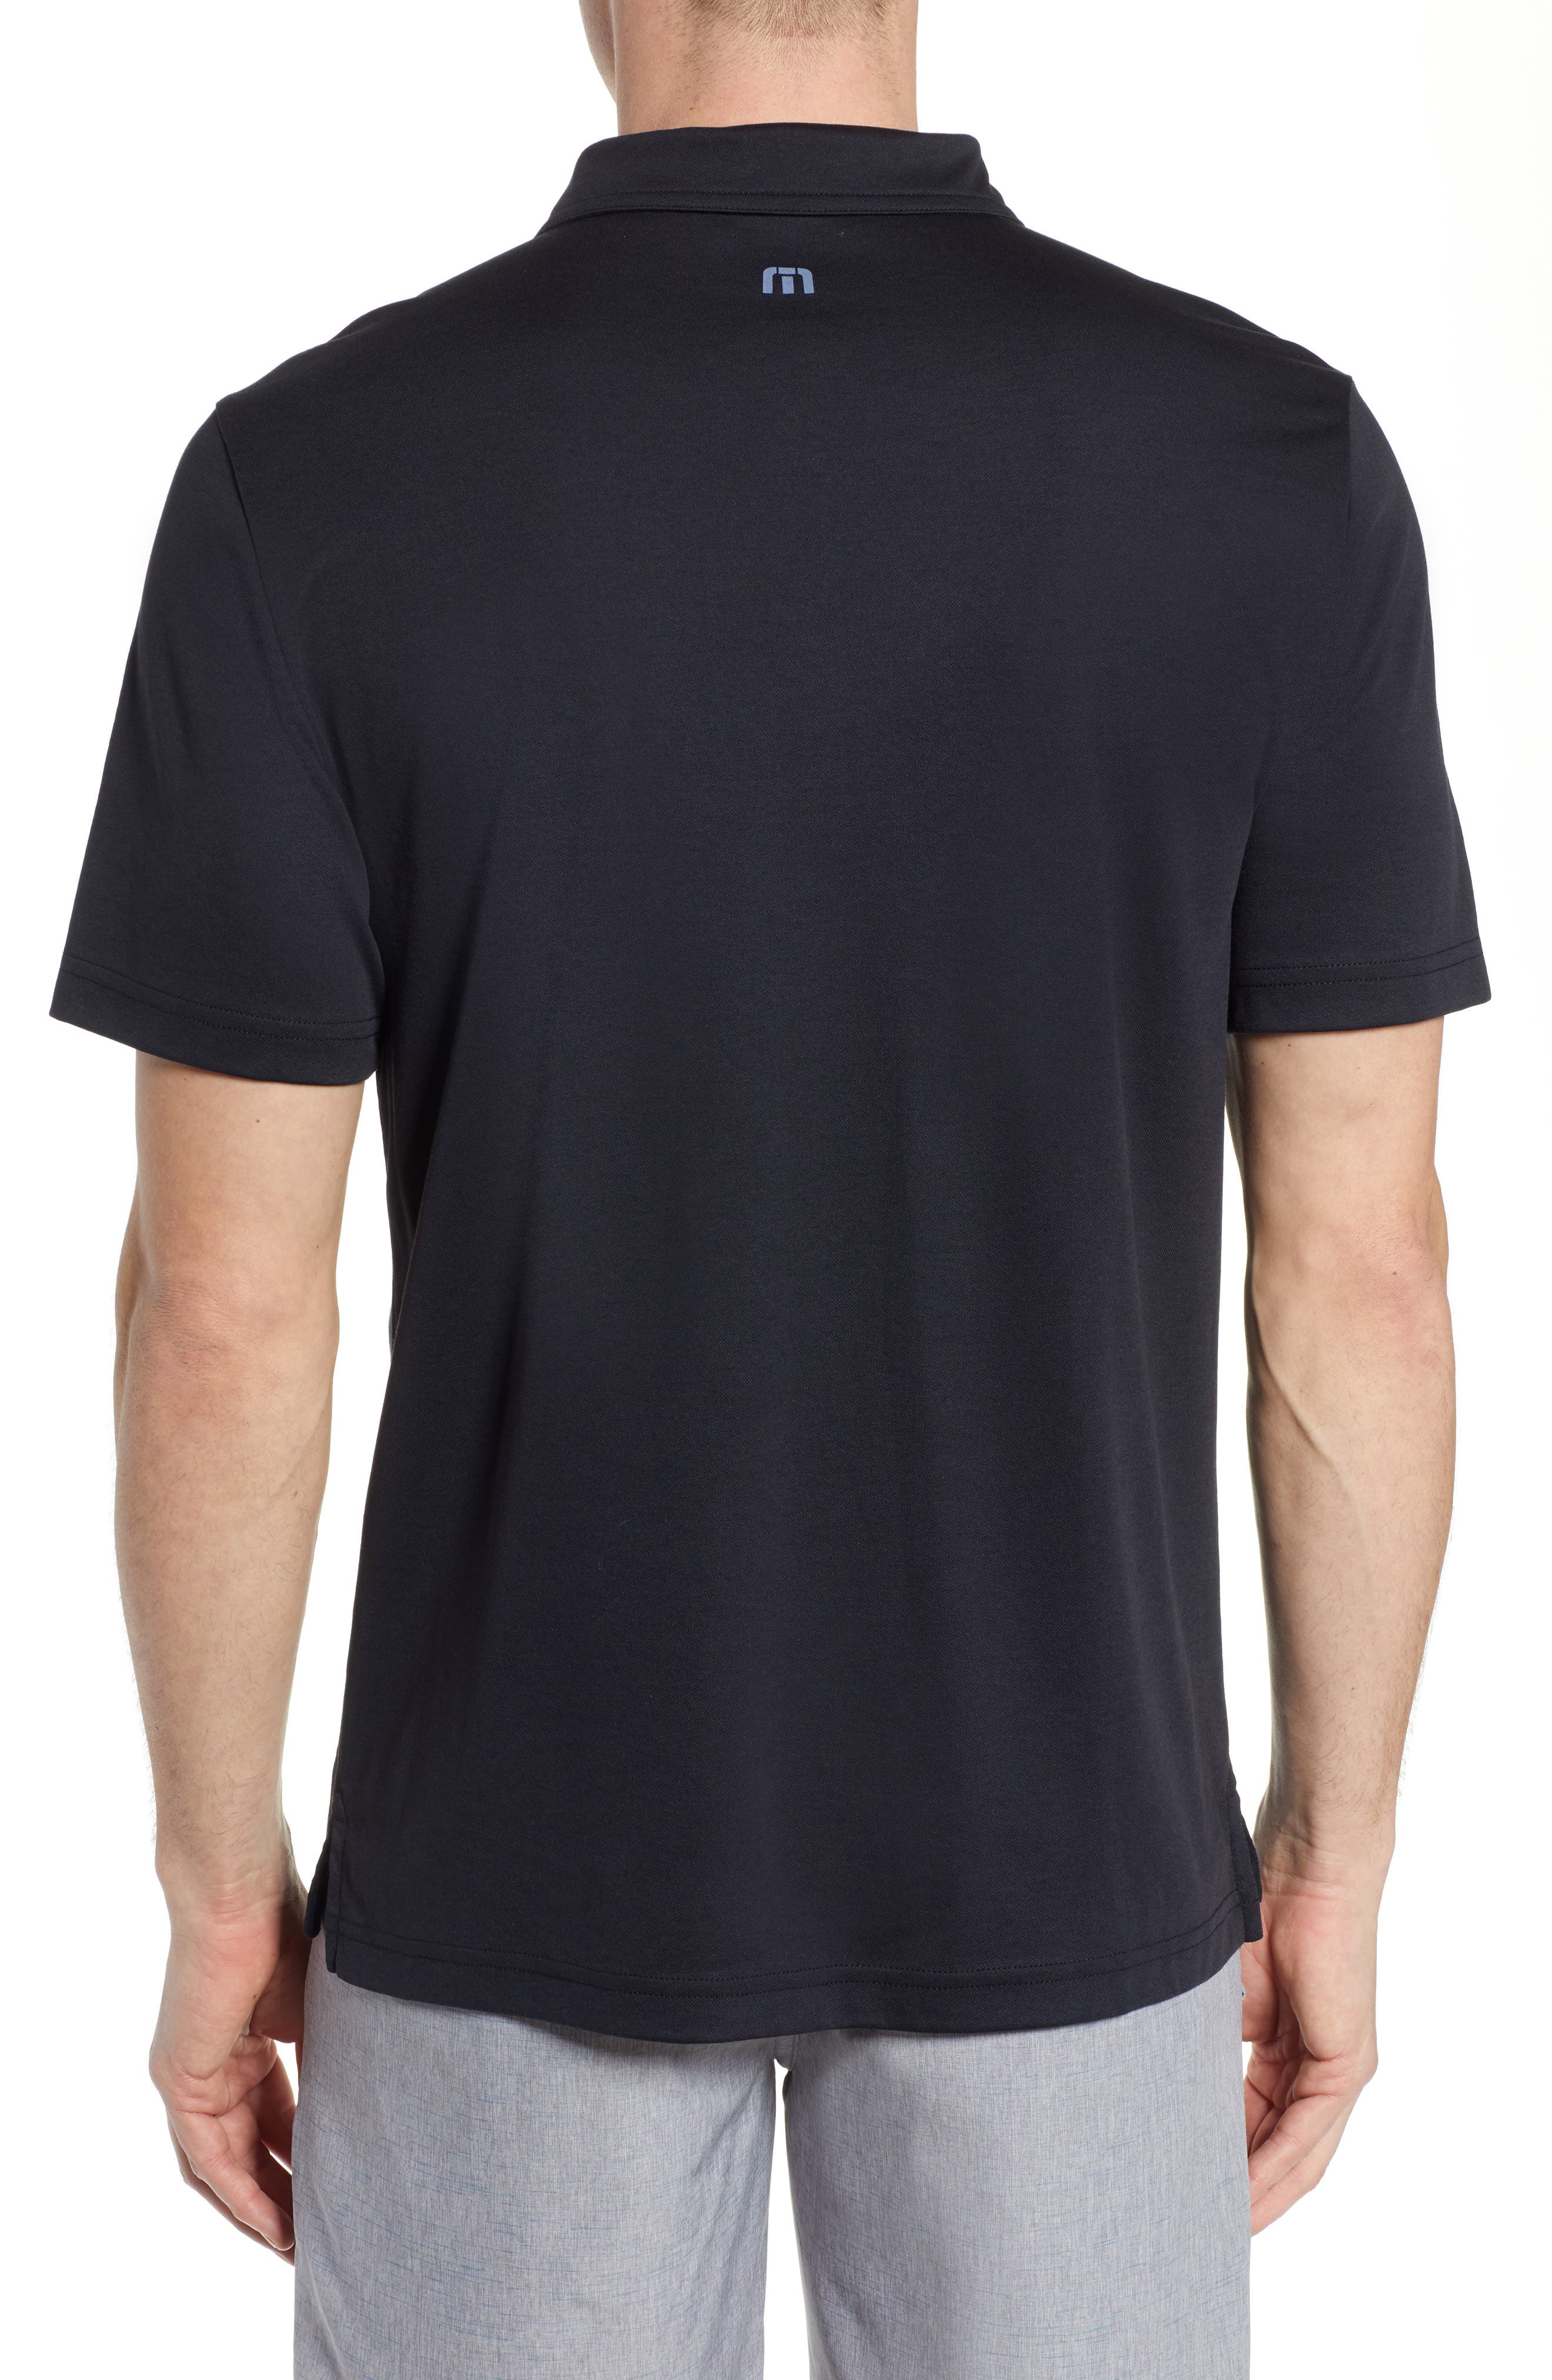 TRAVISMATHEW, Burns Regular Fit Polo, Alternate thumbnail 2, color, BLACK